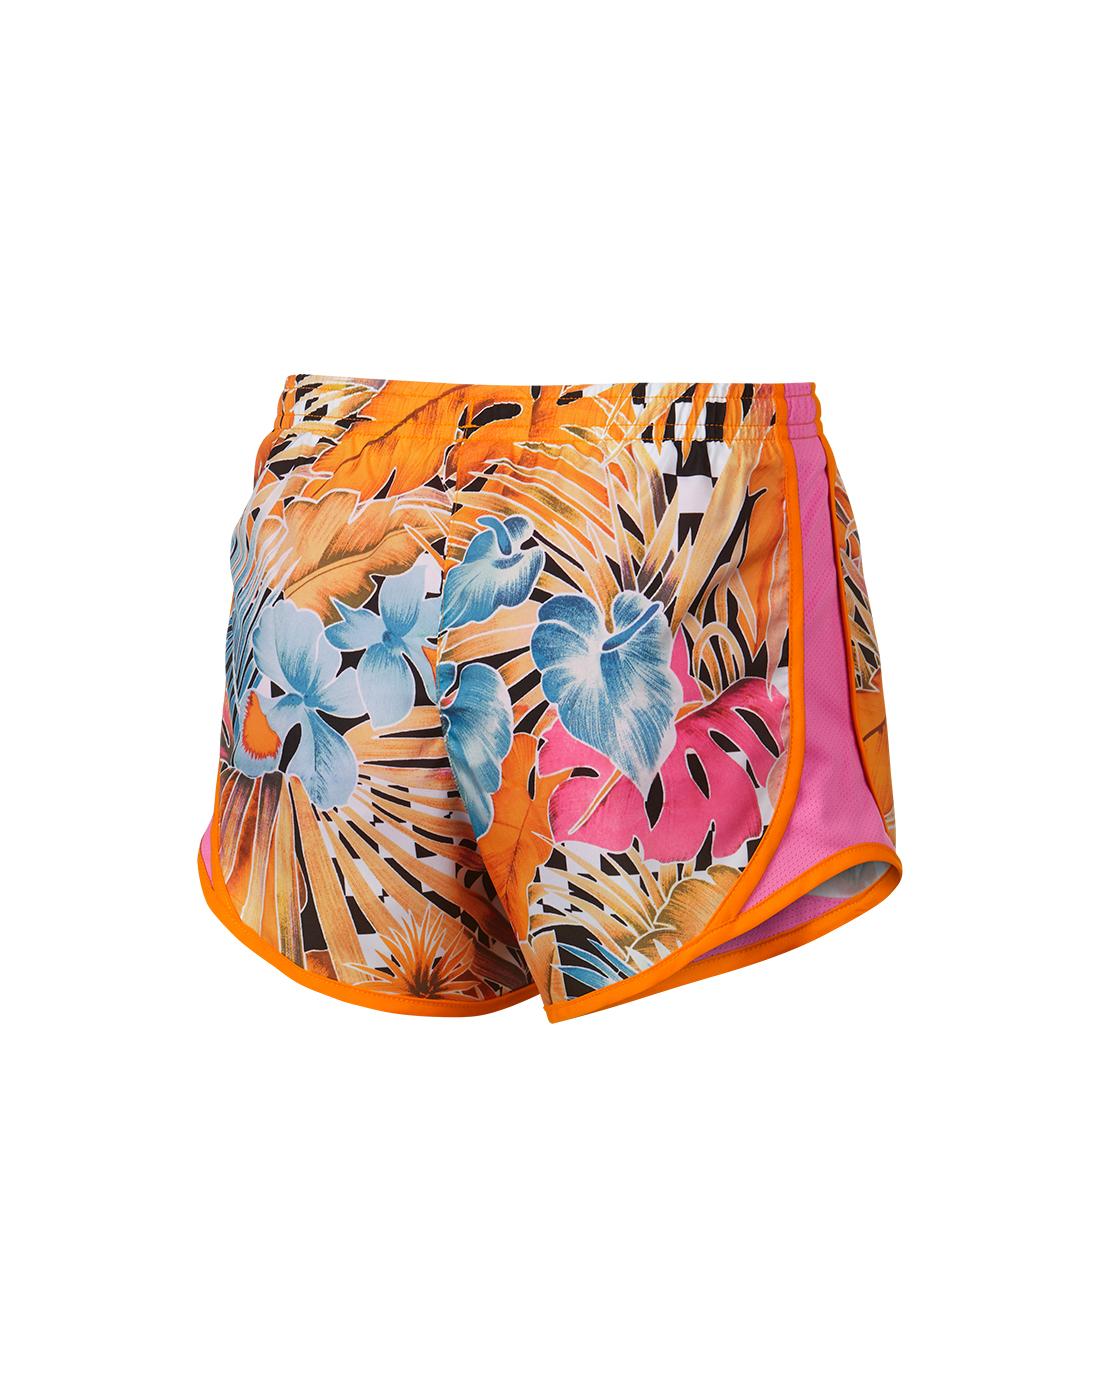 d3618f6e1465 Girl's Orange Floral Nike Tempo Shorts | Life Style Sports